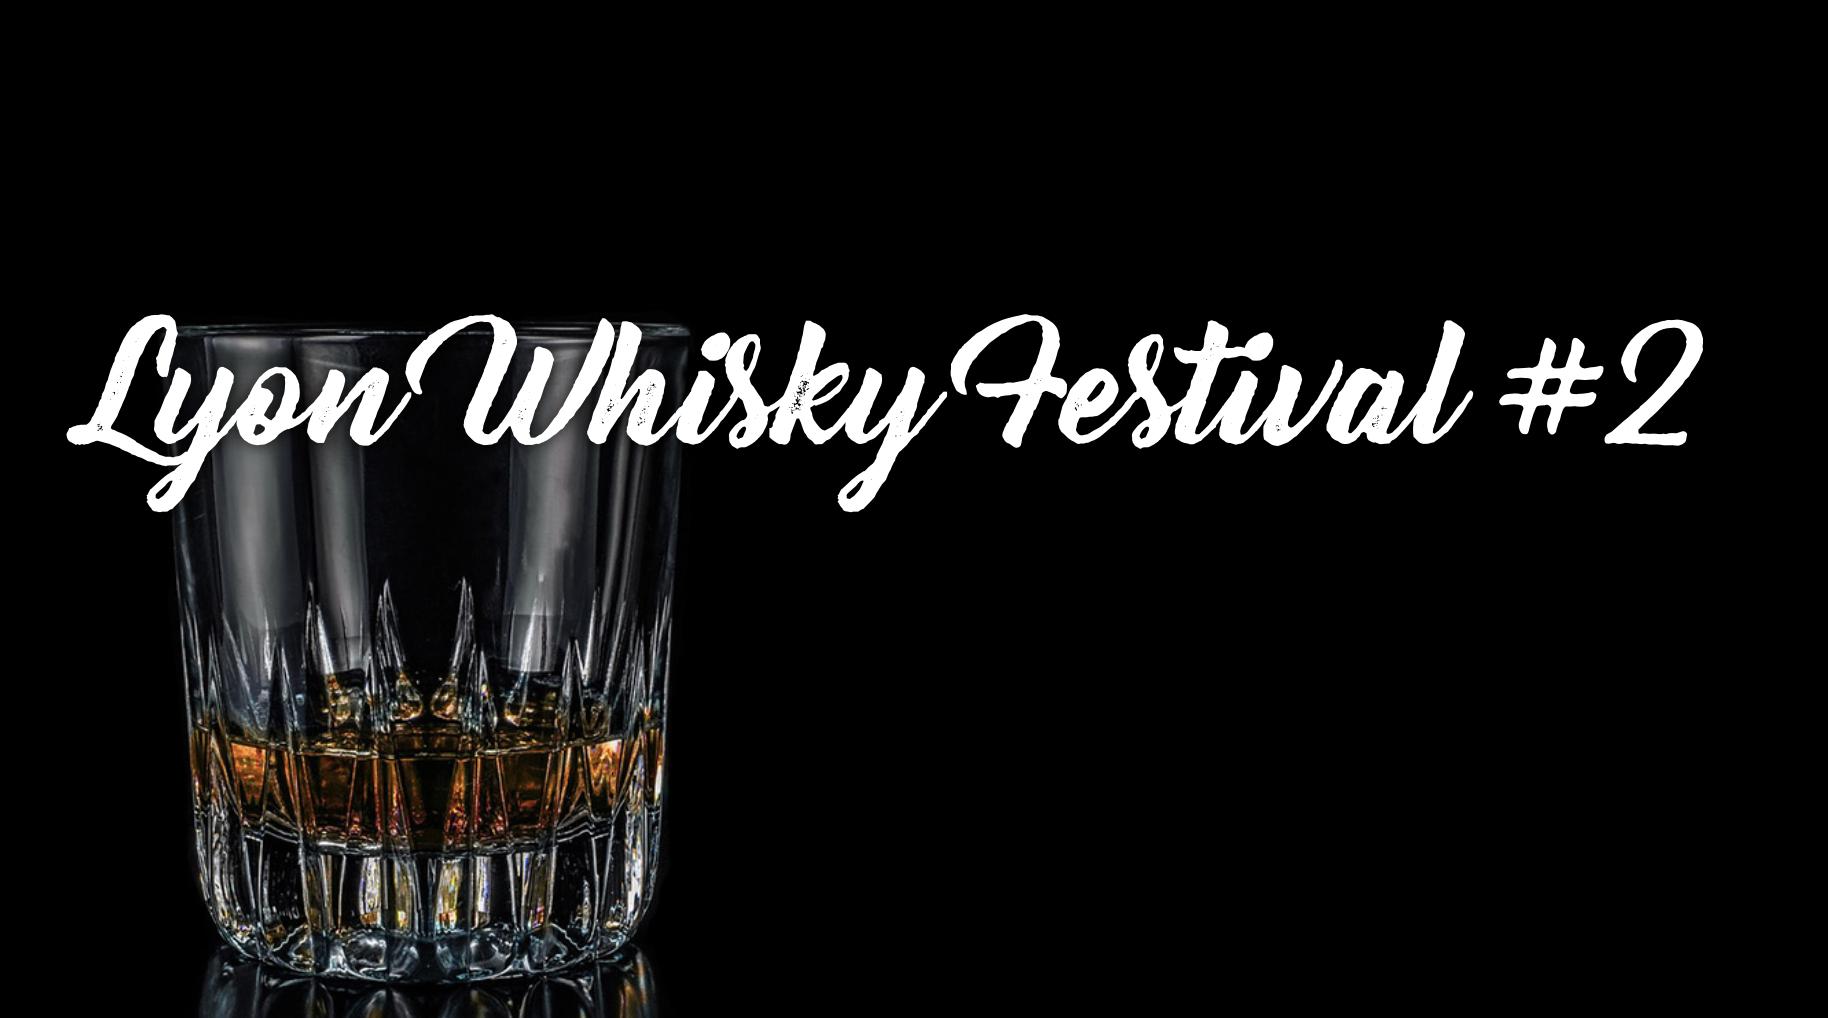 Lyon Whisky Festival #2